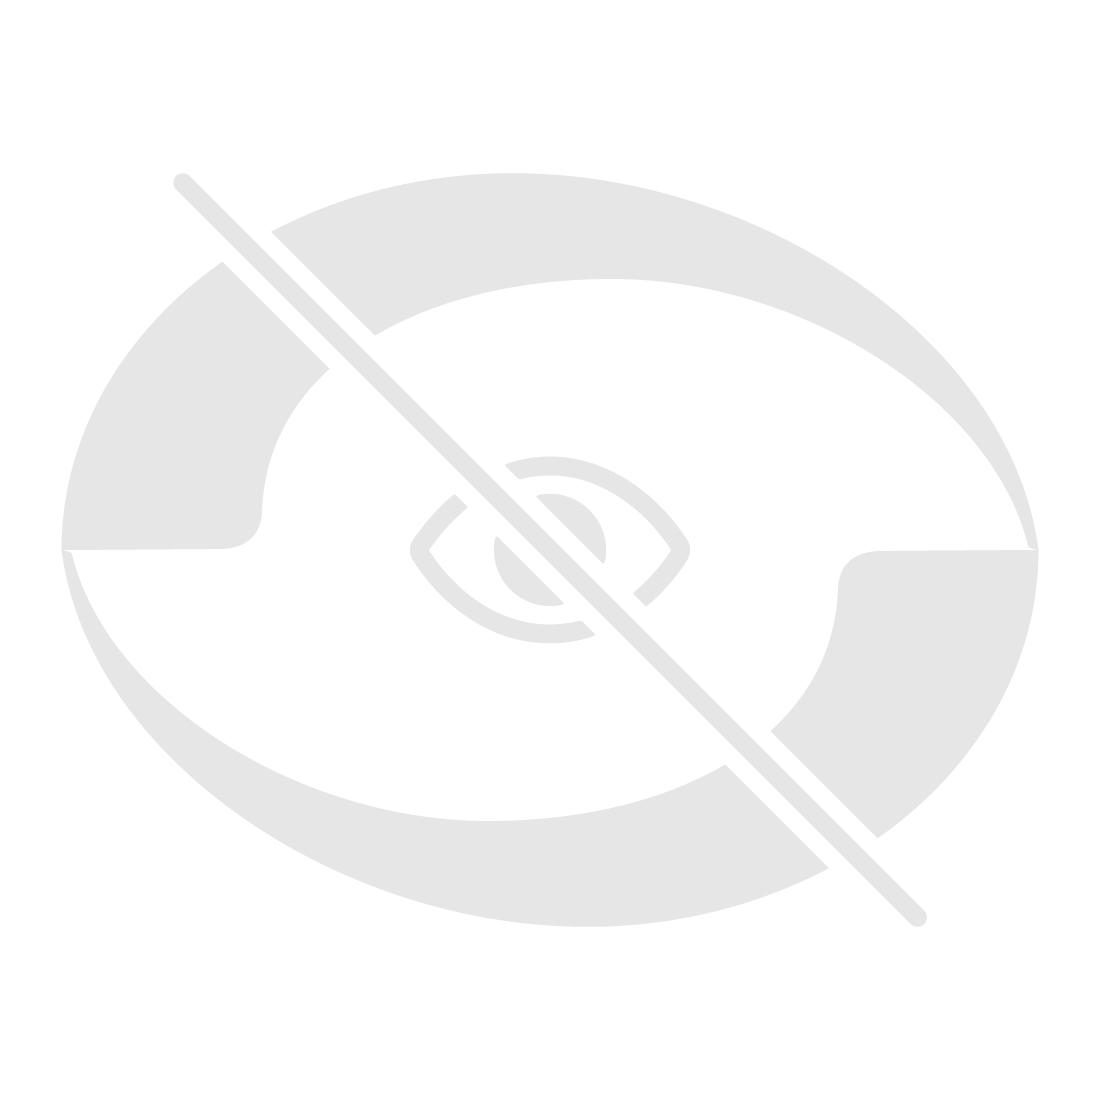 LED Driver, 12 V DC / 2.1 A / 25 W